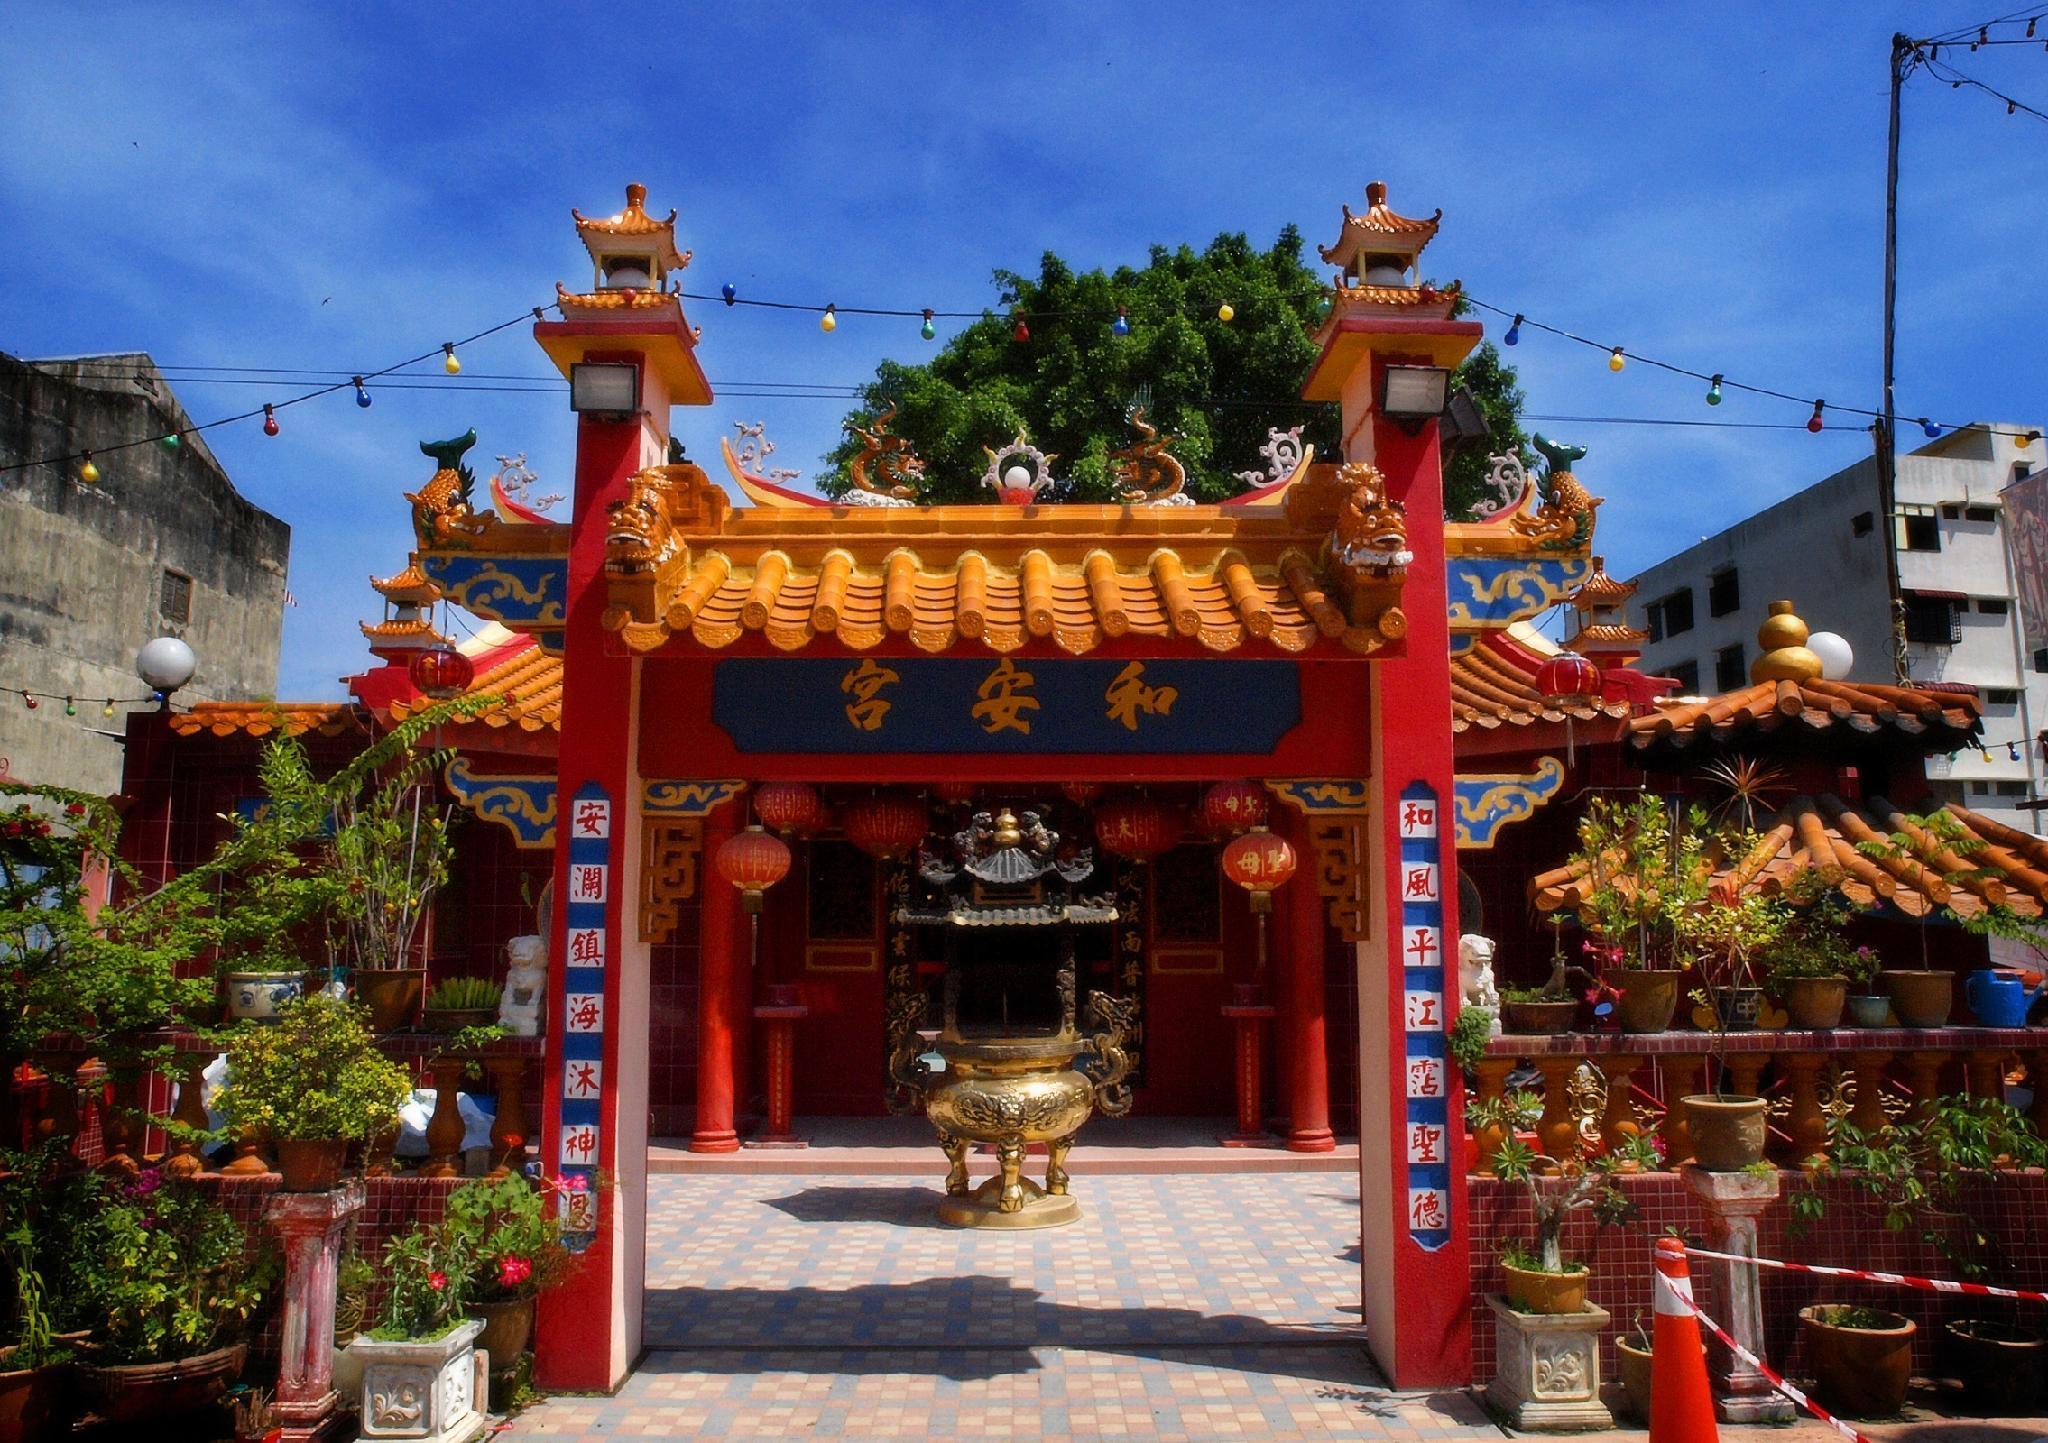 William'S Lodge, Kuala Terengganu